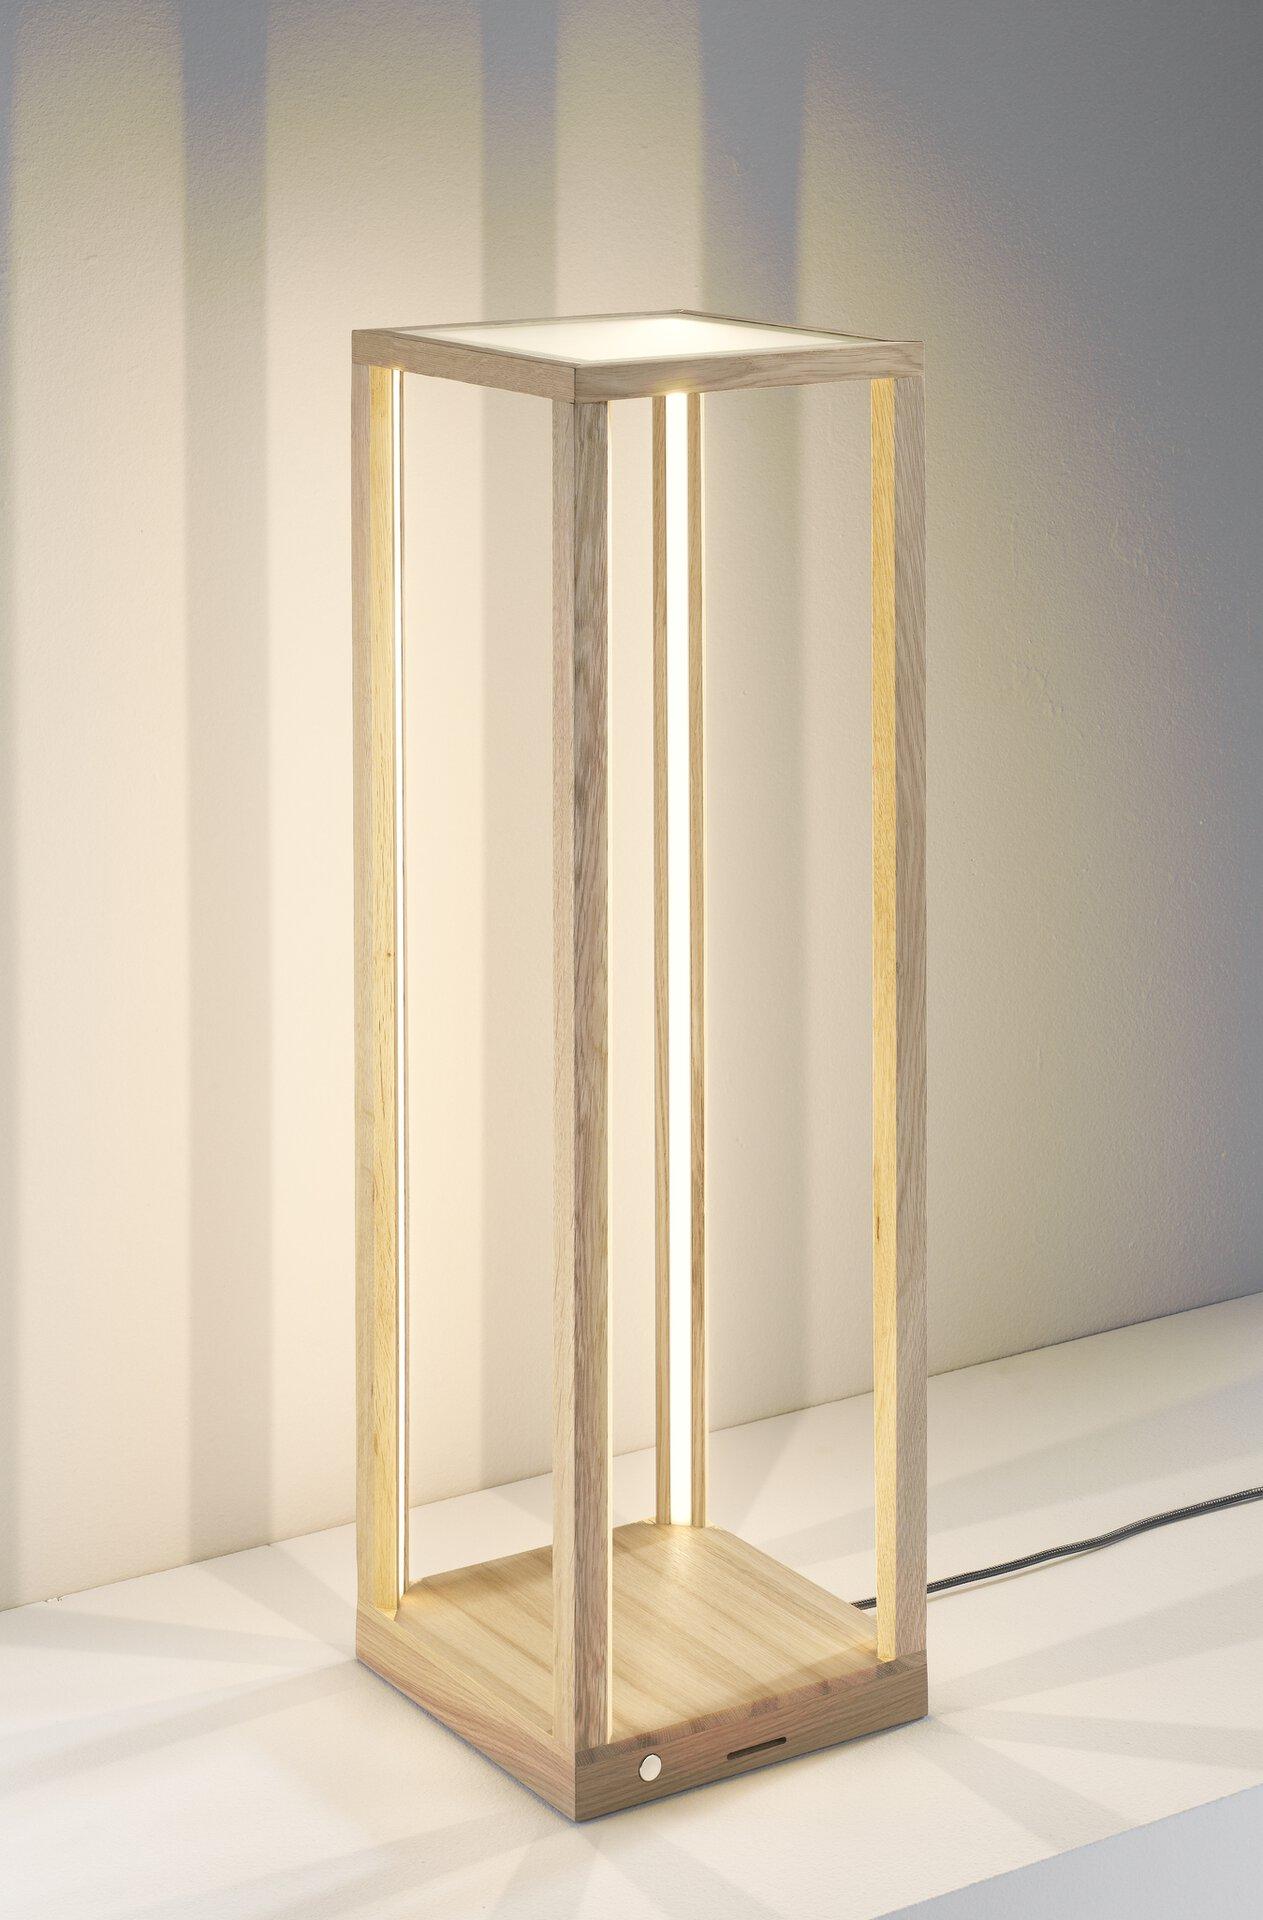 Tischleuchte TAVOLI GLAS MONDO Holz braun 25 x 82 x 25 cm